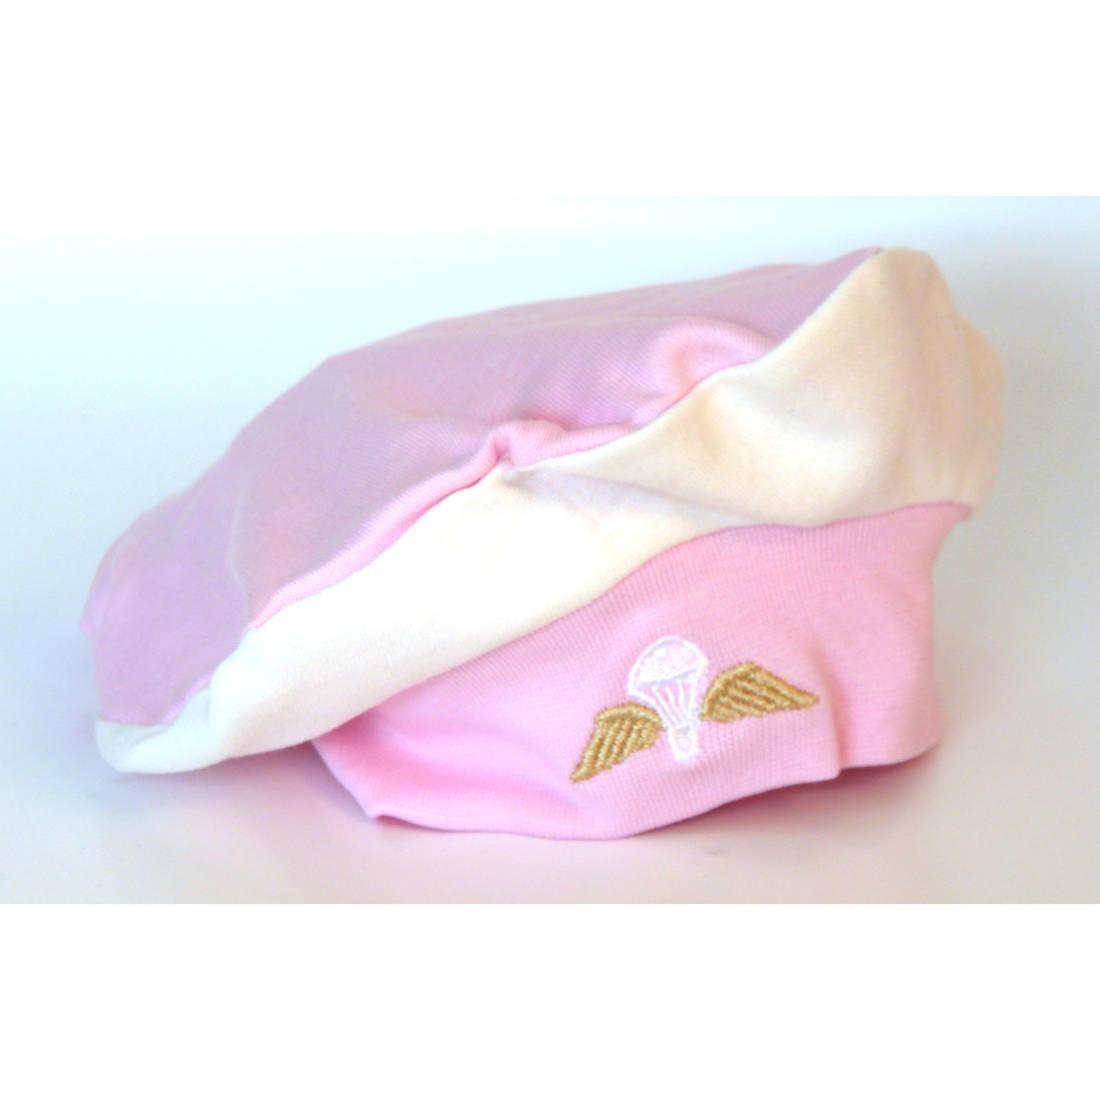 Airborne Baby Hats